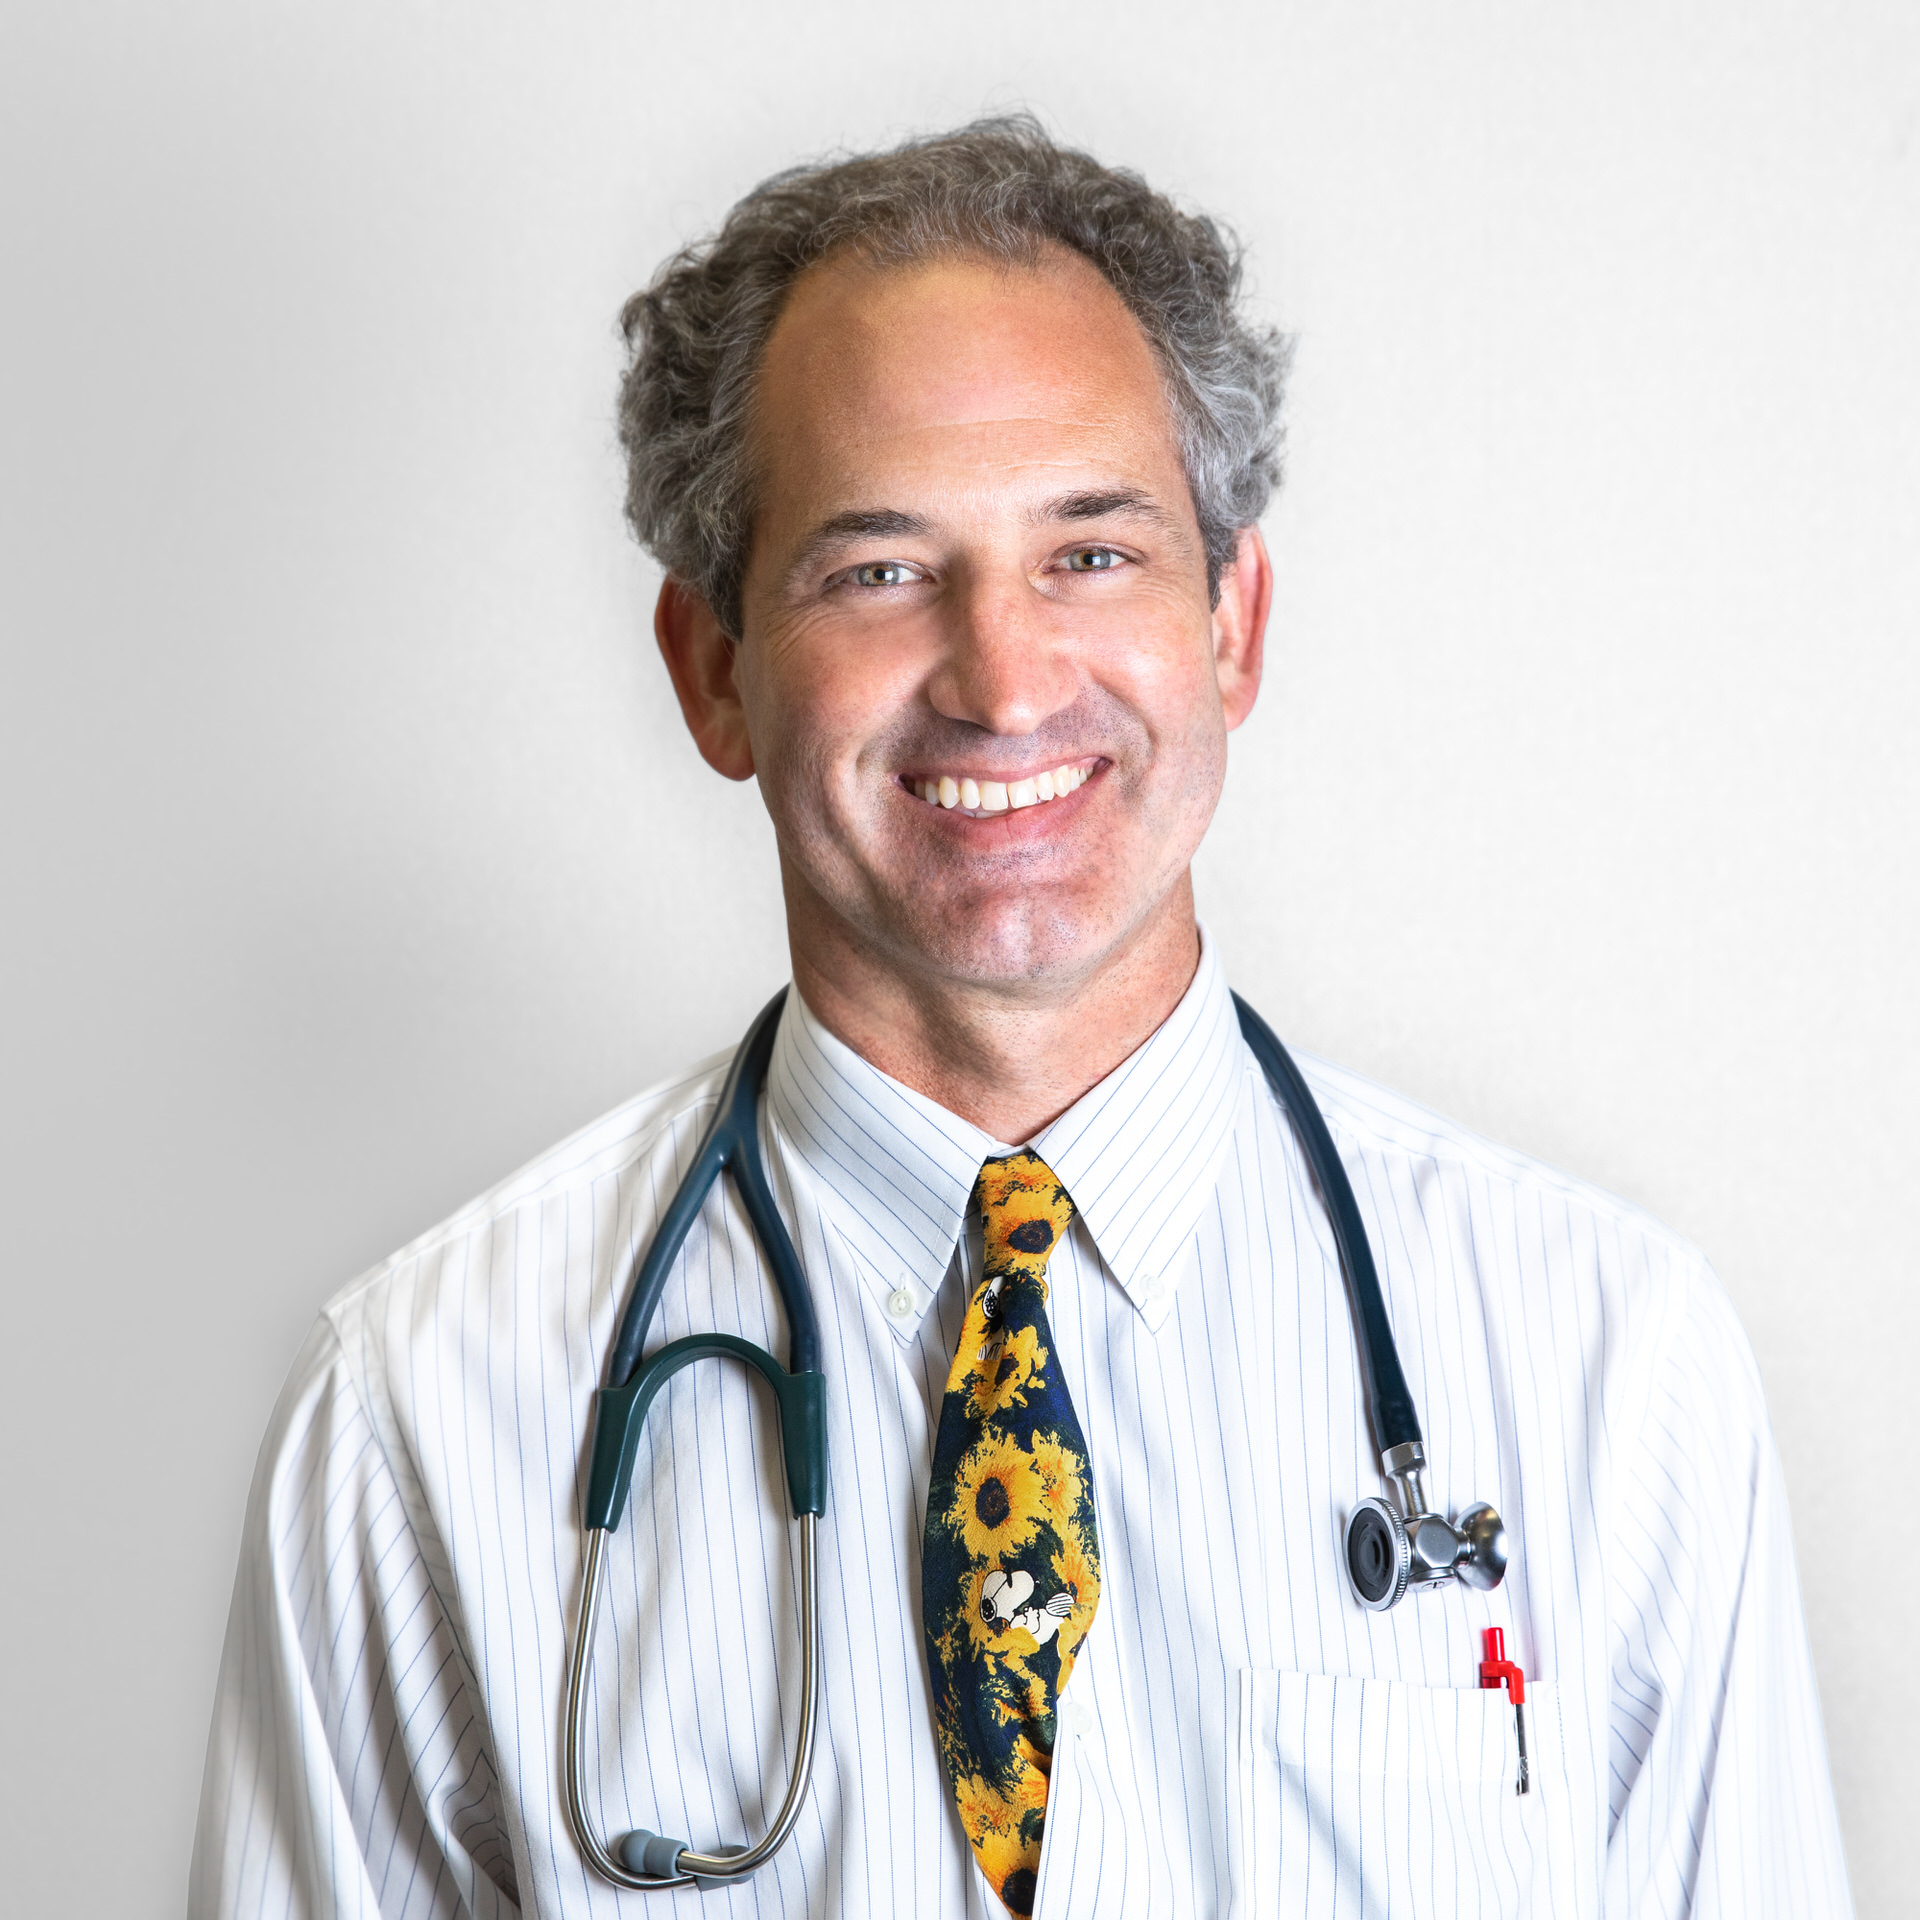 Dr. Douglas Nesbit